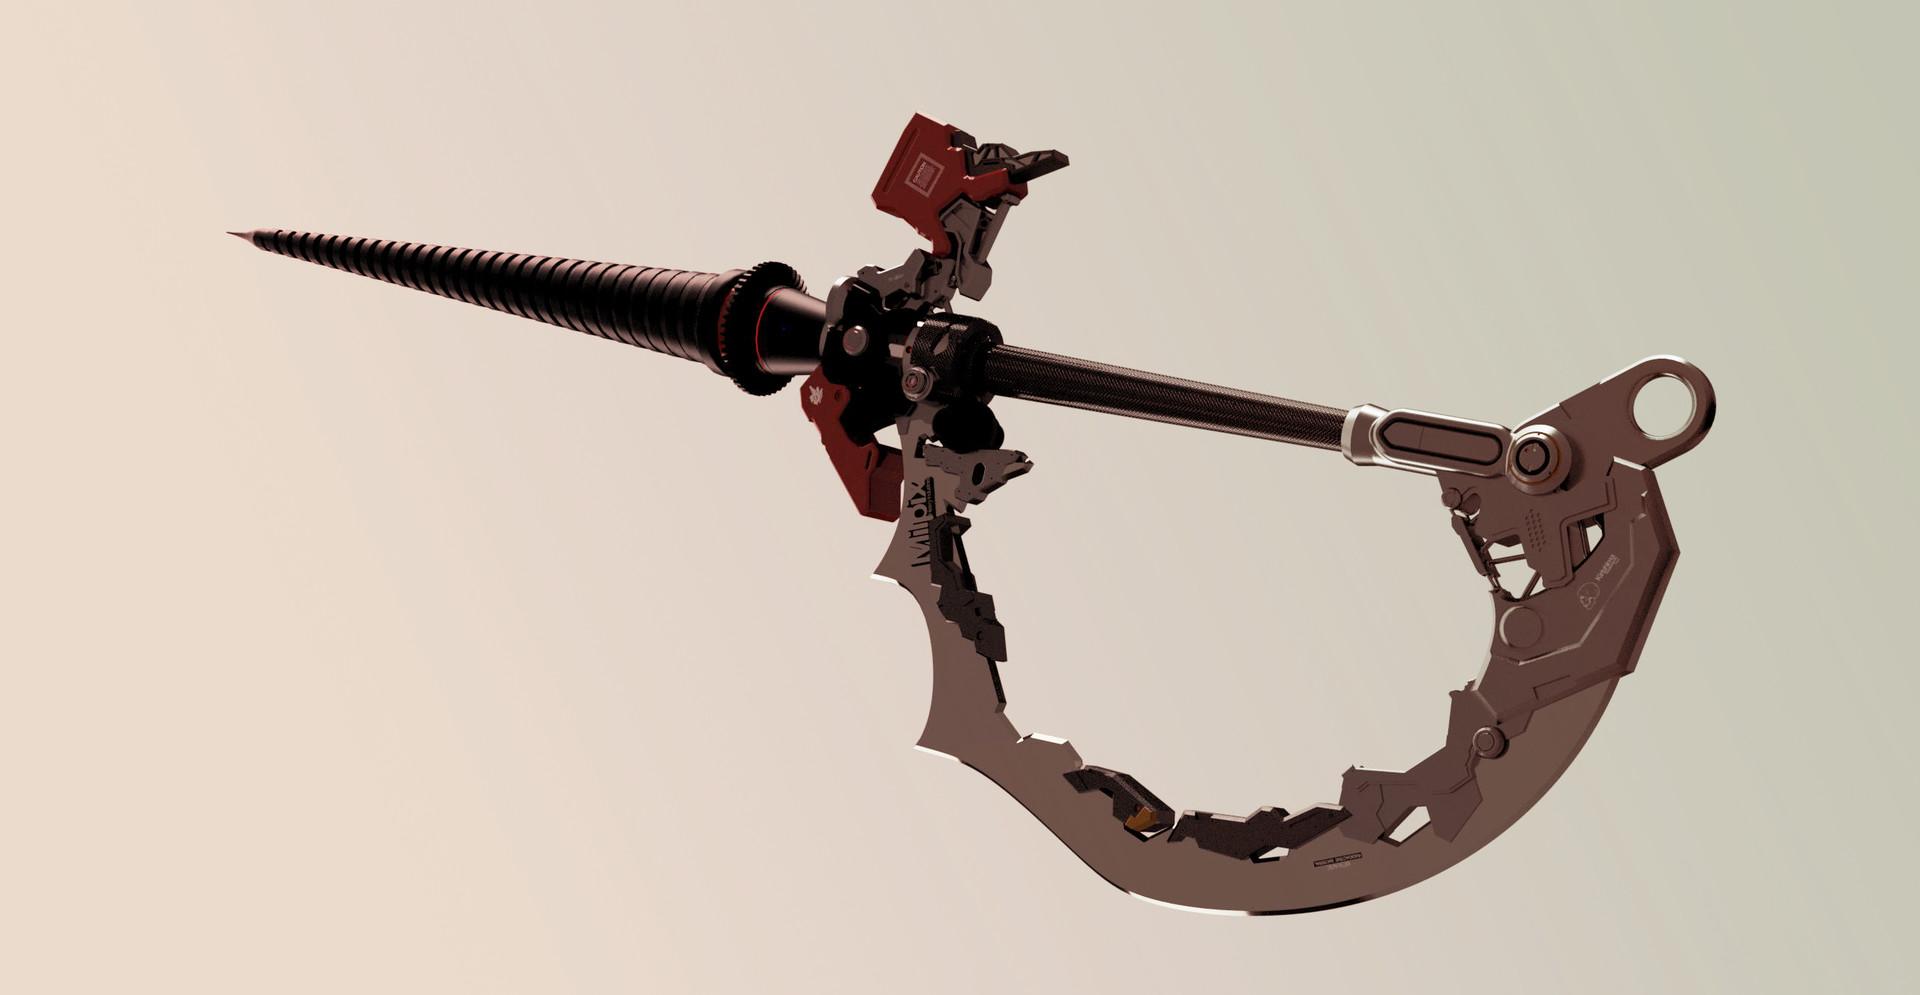 Milpix drillspike